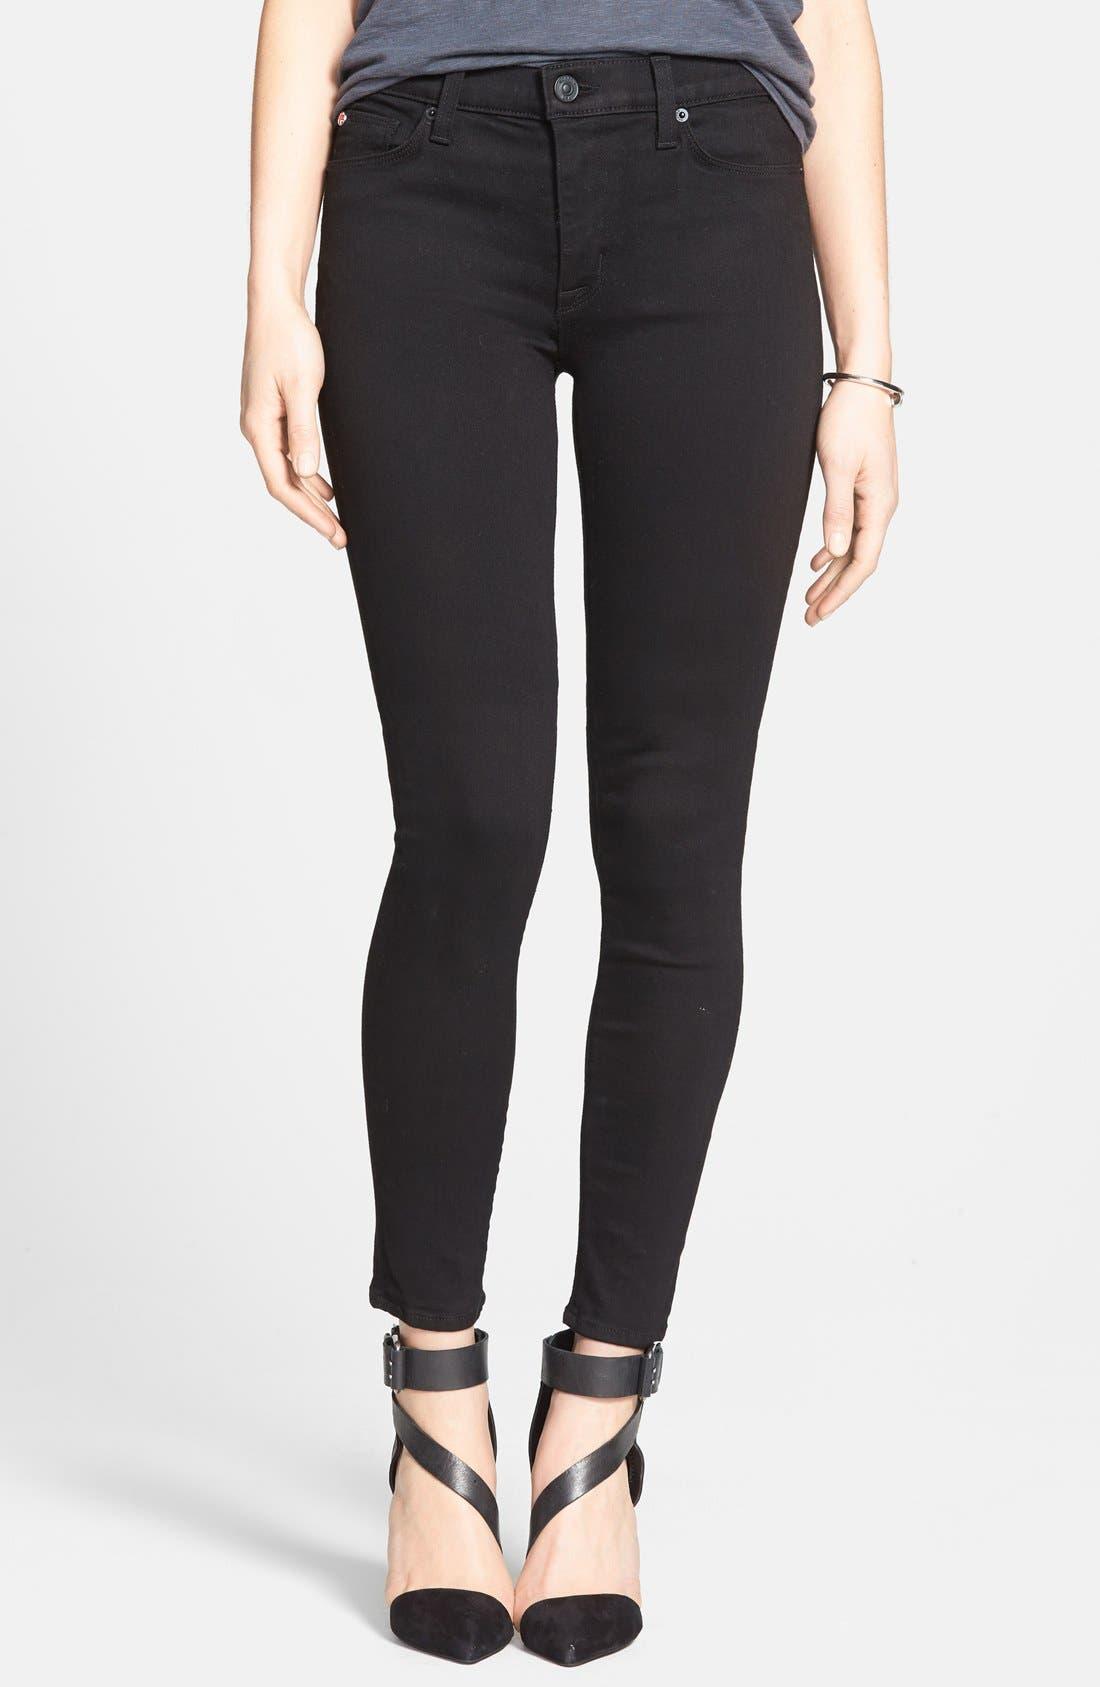 Main Image - Hudson Jeans 'Nico' Mid Rise Super Skinny Jeans (Black)